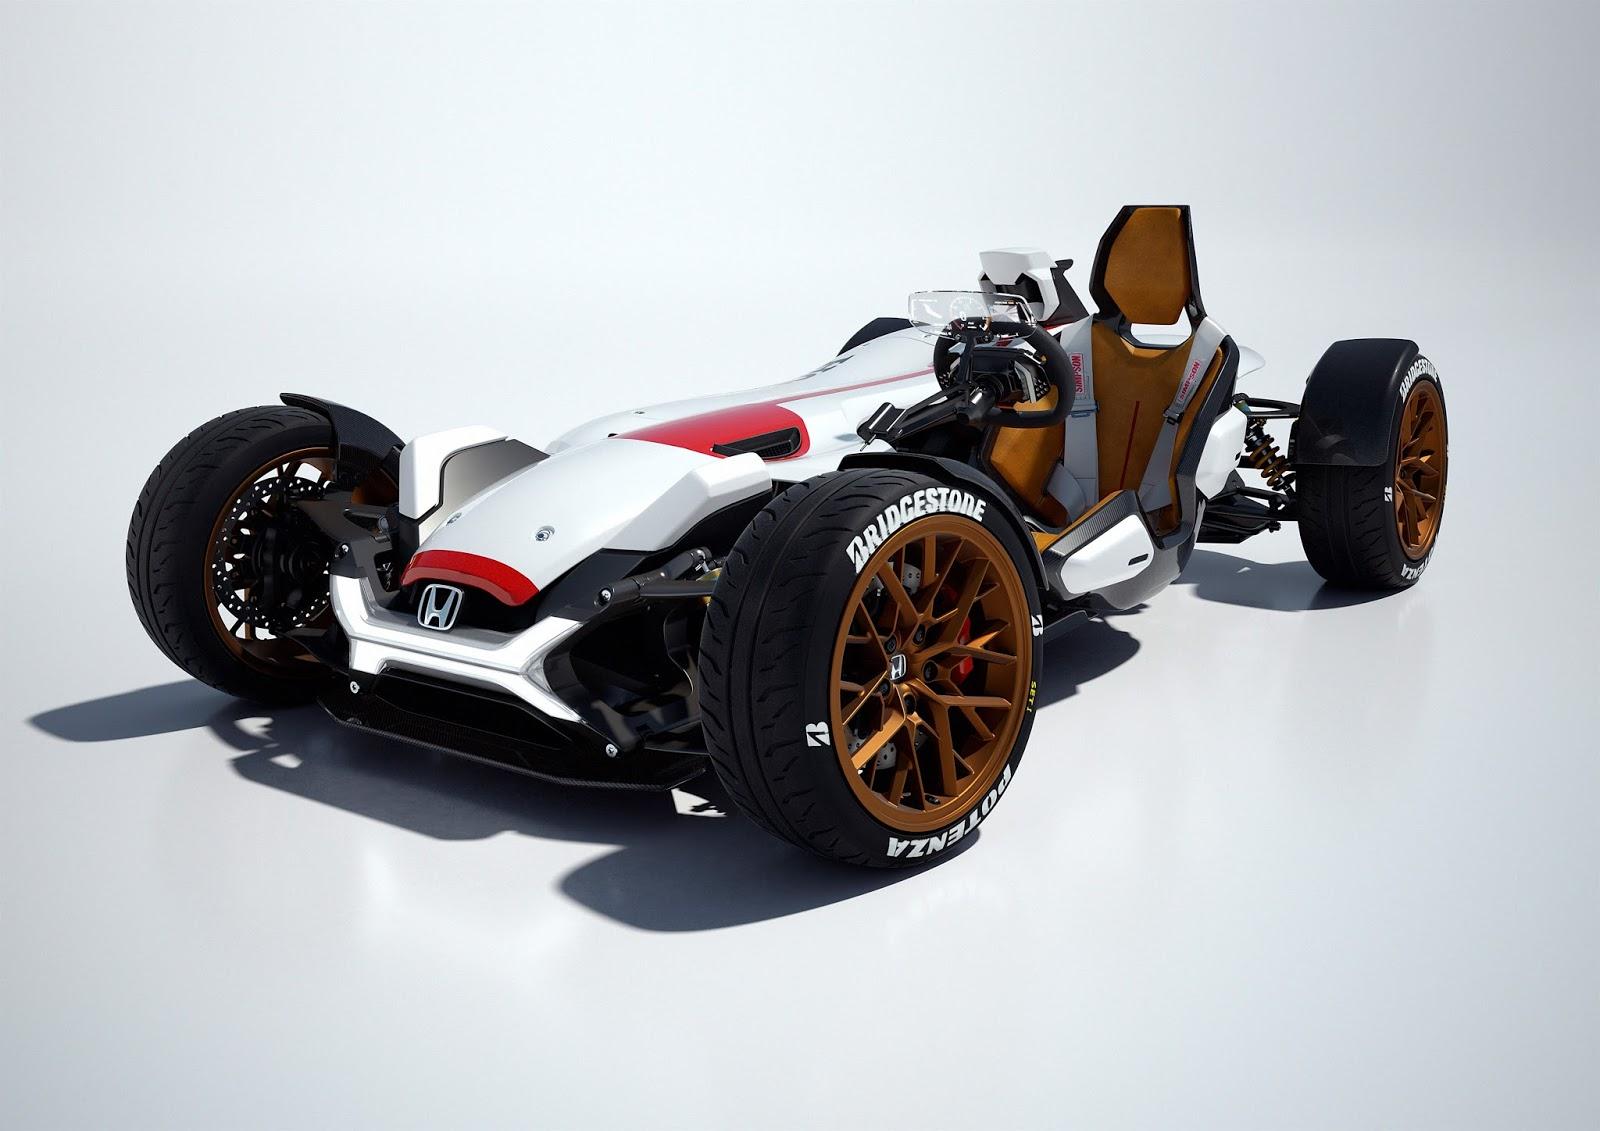 60394 HONDA PROJECT 2 4 POWERED BY RC213V TO DEBUT AT FRANKFURT A COMBINATION OF Η Honda θα παρουσιάσει το S660, ενα λιλιπούτειο διθέσιο roadster με 63 άλογα από μολις 658 κ.εκ